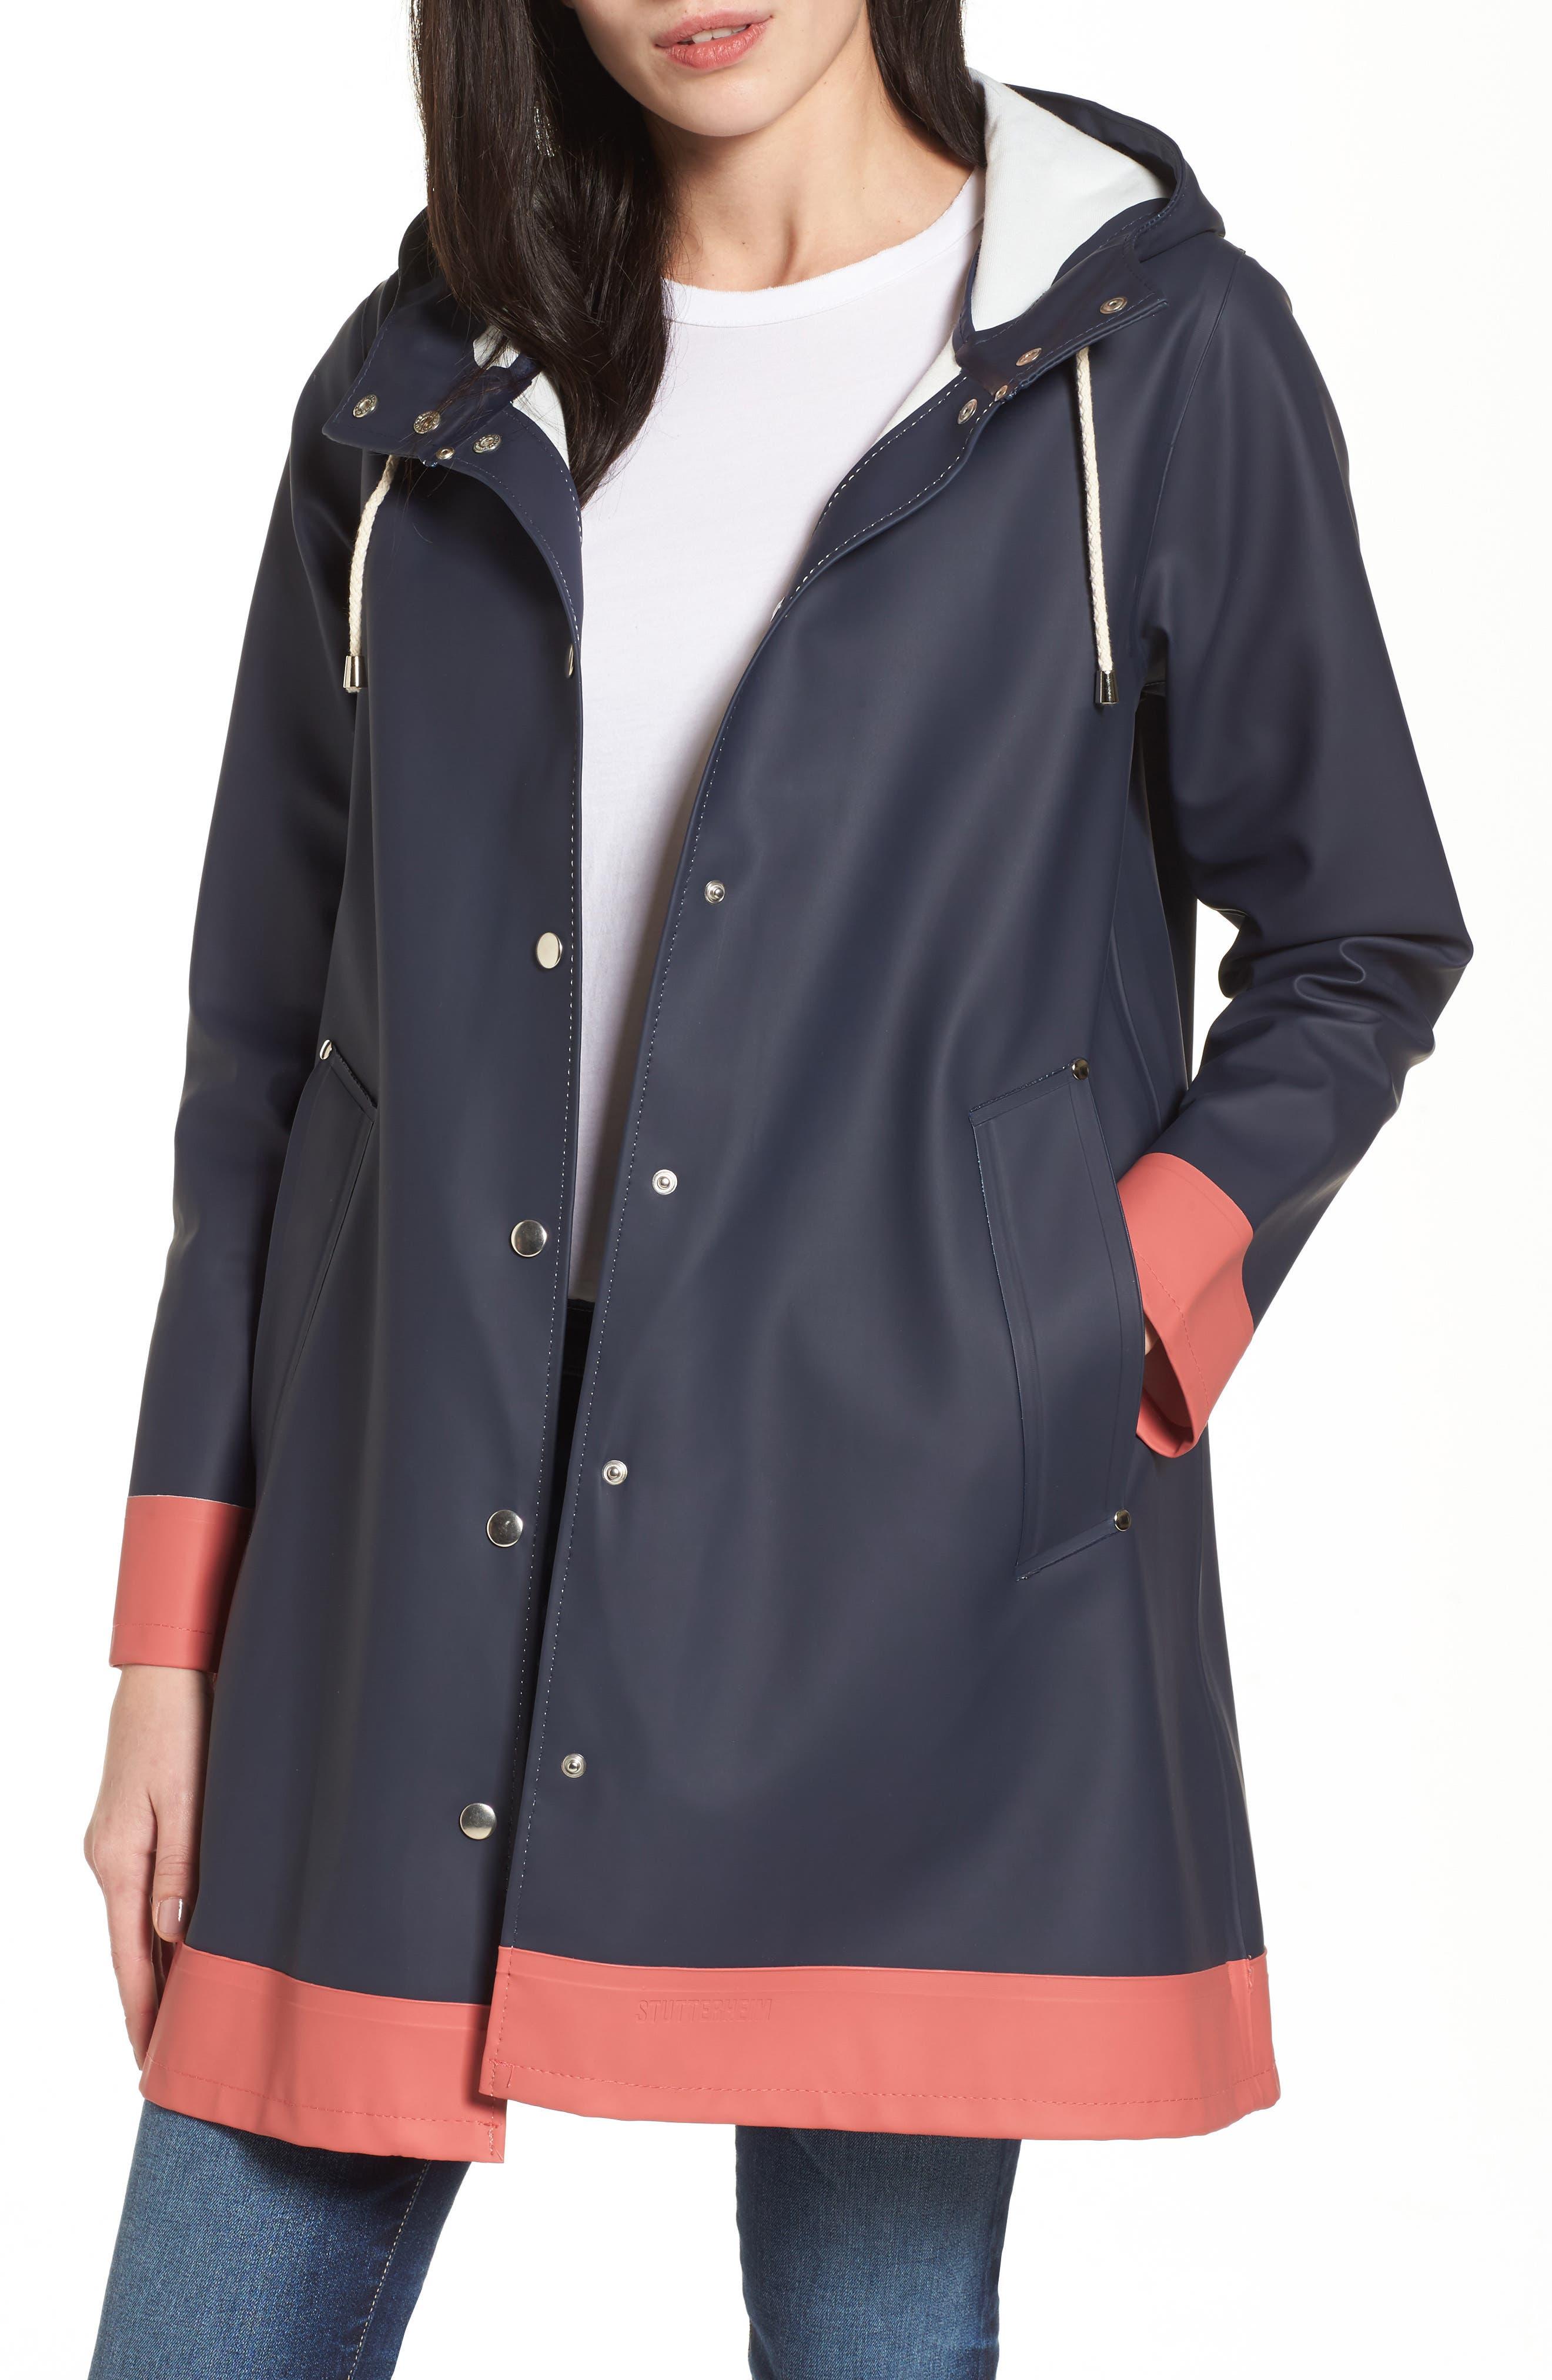 Mosebacke Frame Colorblock Raincoat,                         Main,                         color, Navy/ Faded Rose